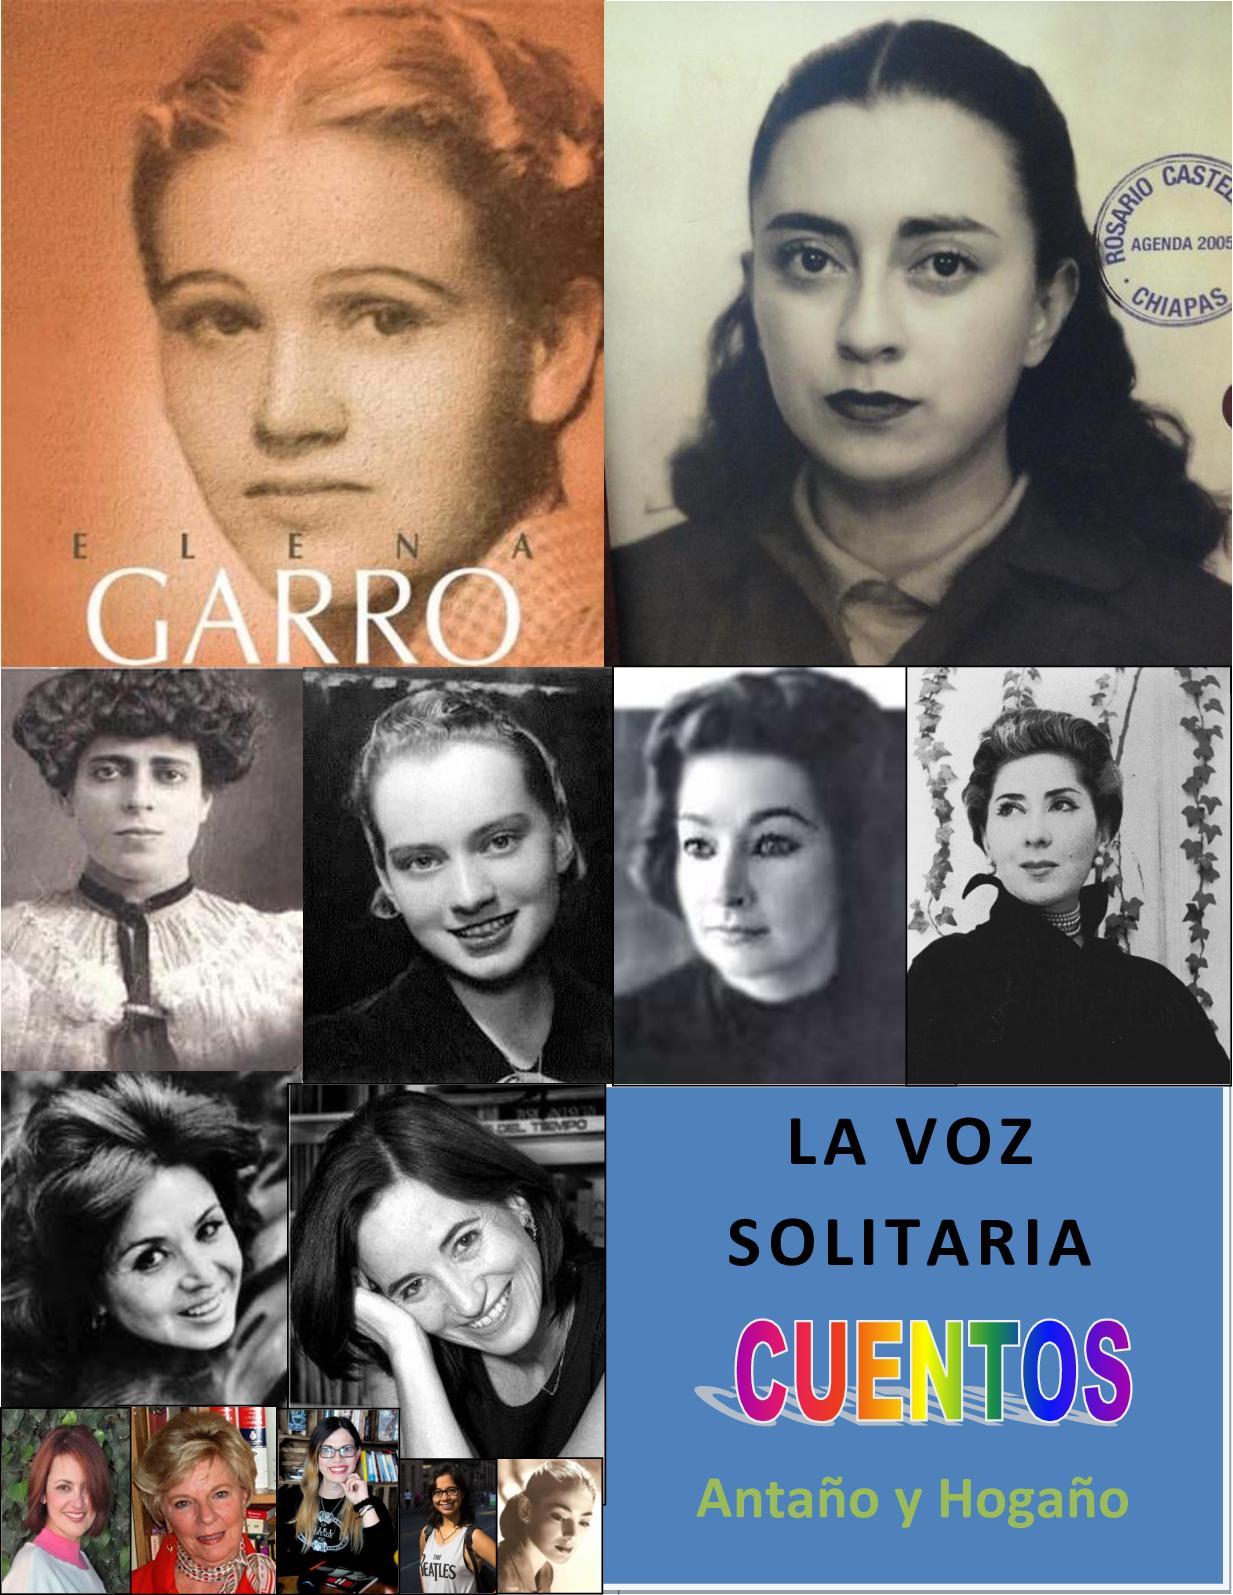 Mujeres Cd Juarez 397895